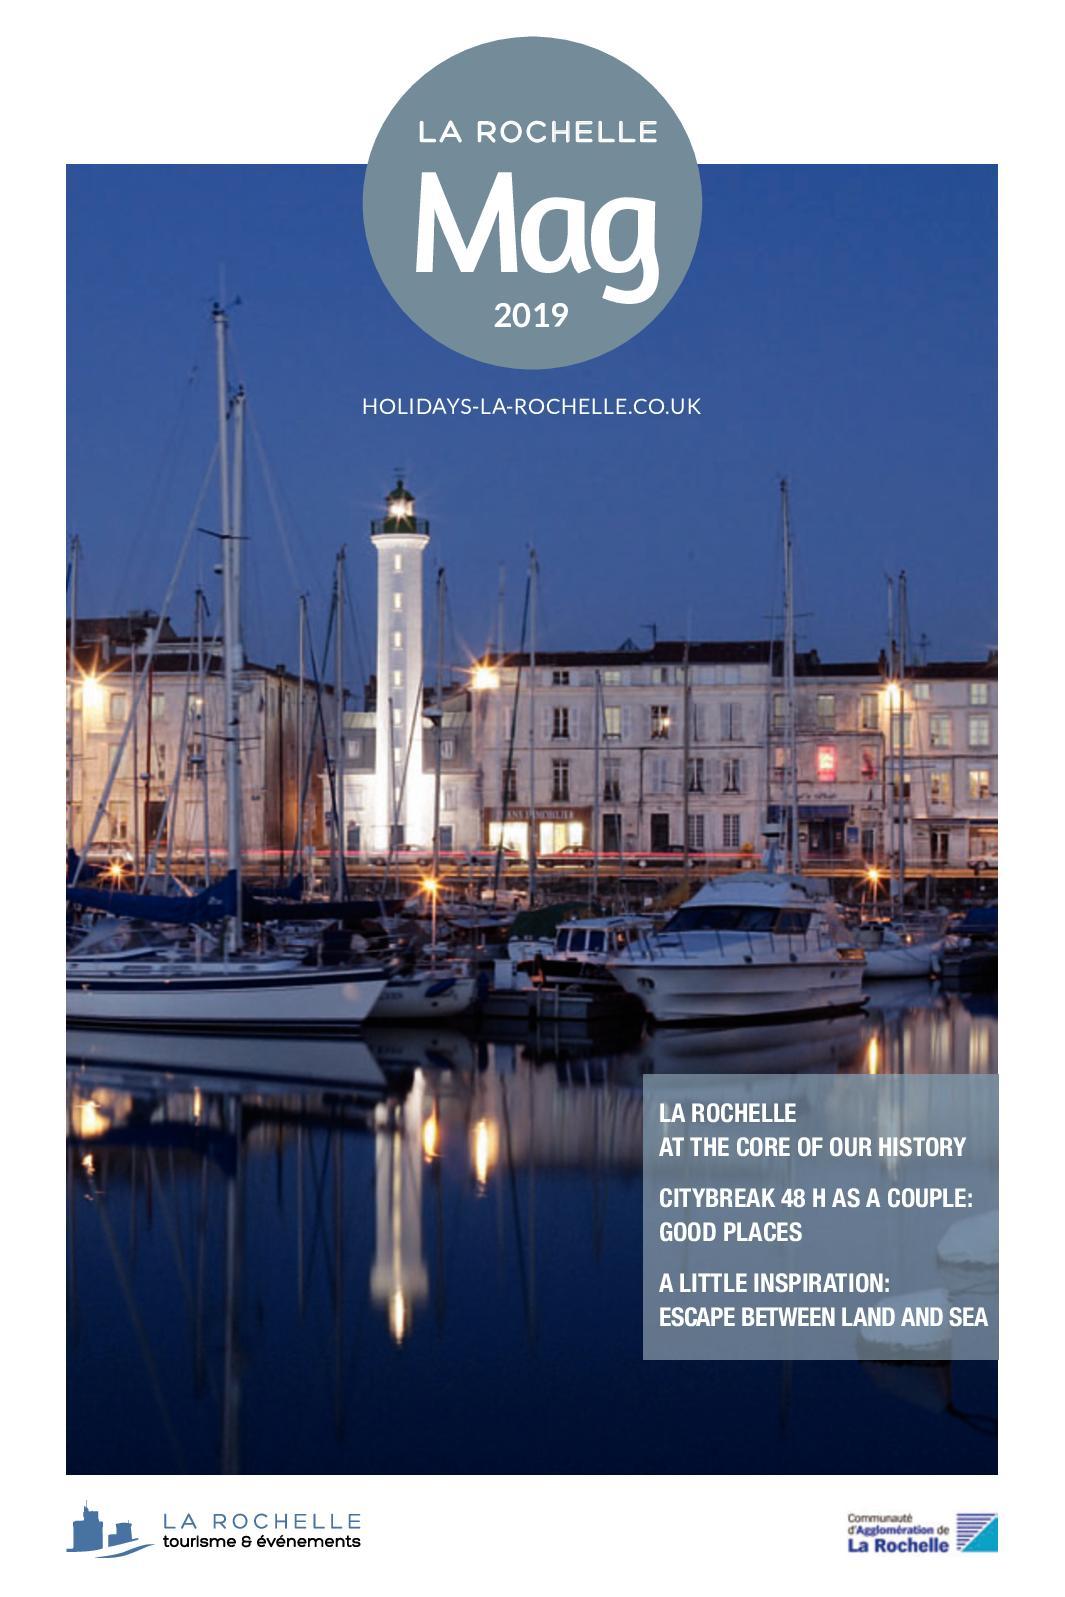 Salon De Jardin Blanc Charmant Calaméo La Rochelle City Guide 2019 Of 40 Beau Salon De Jardin Blanc